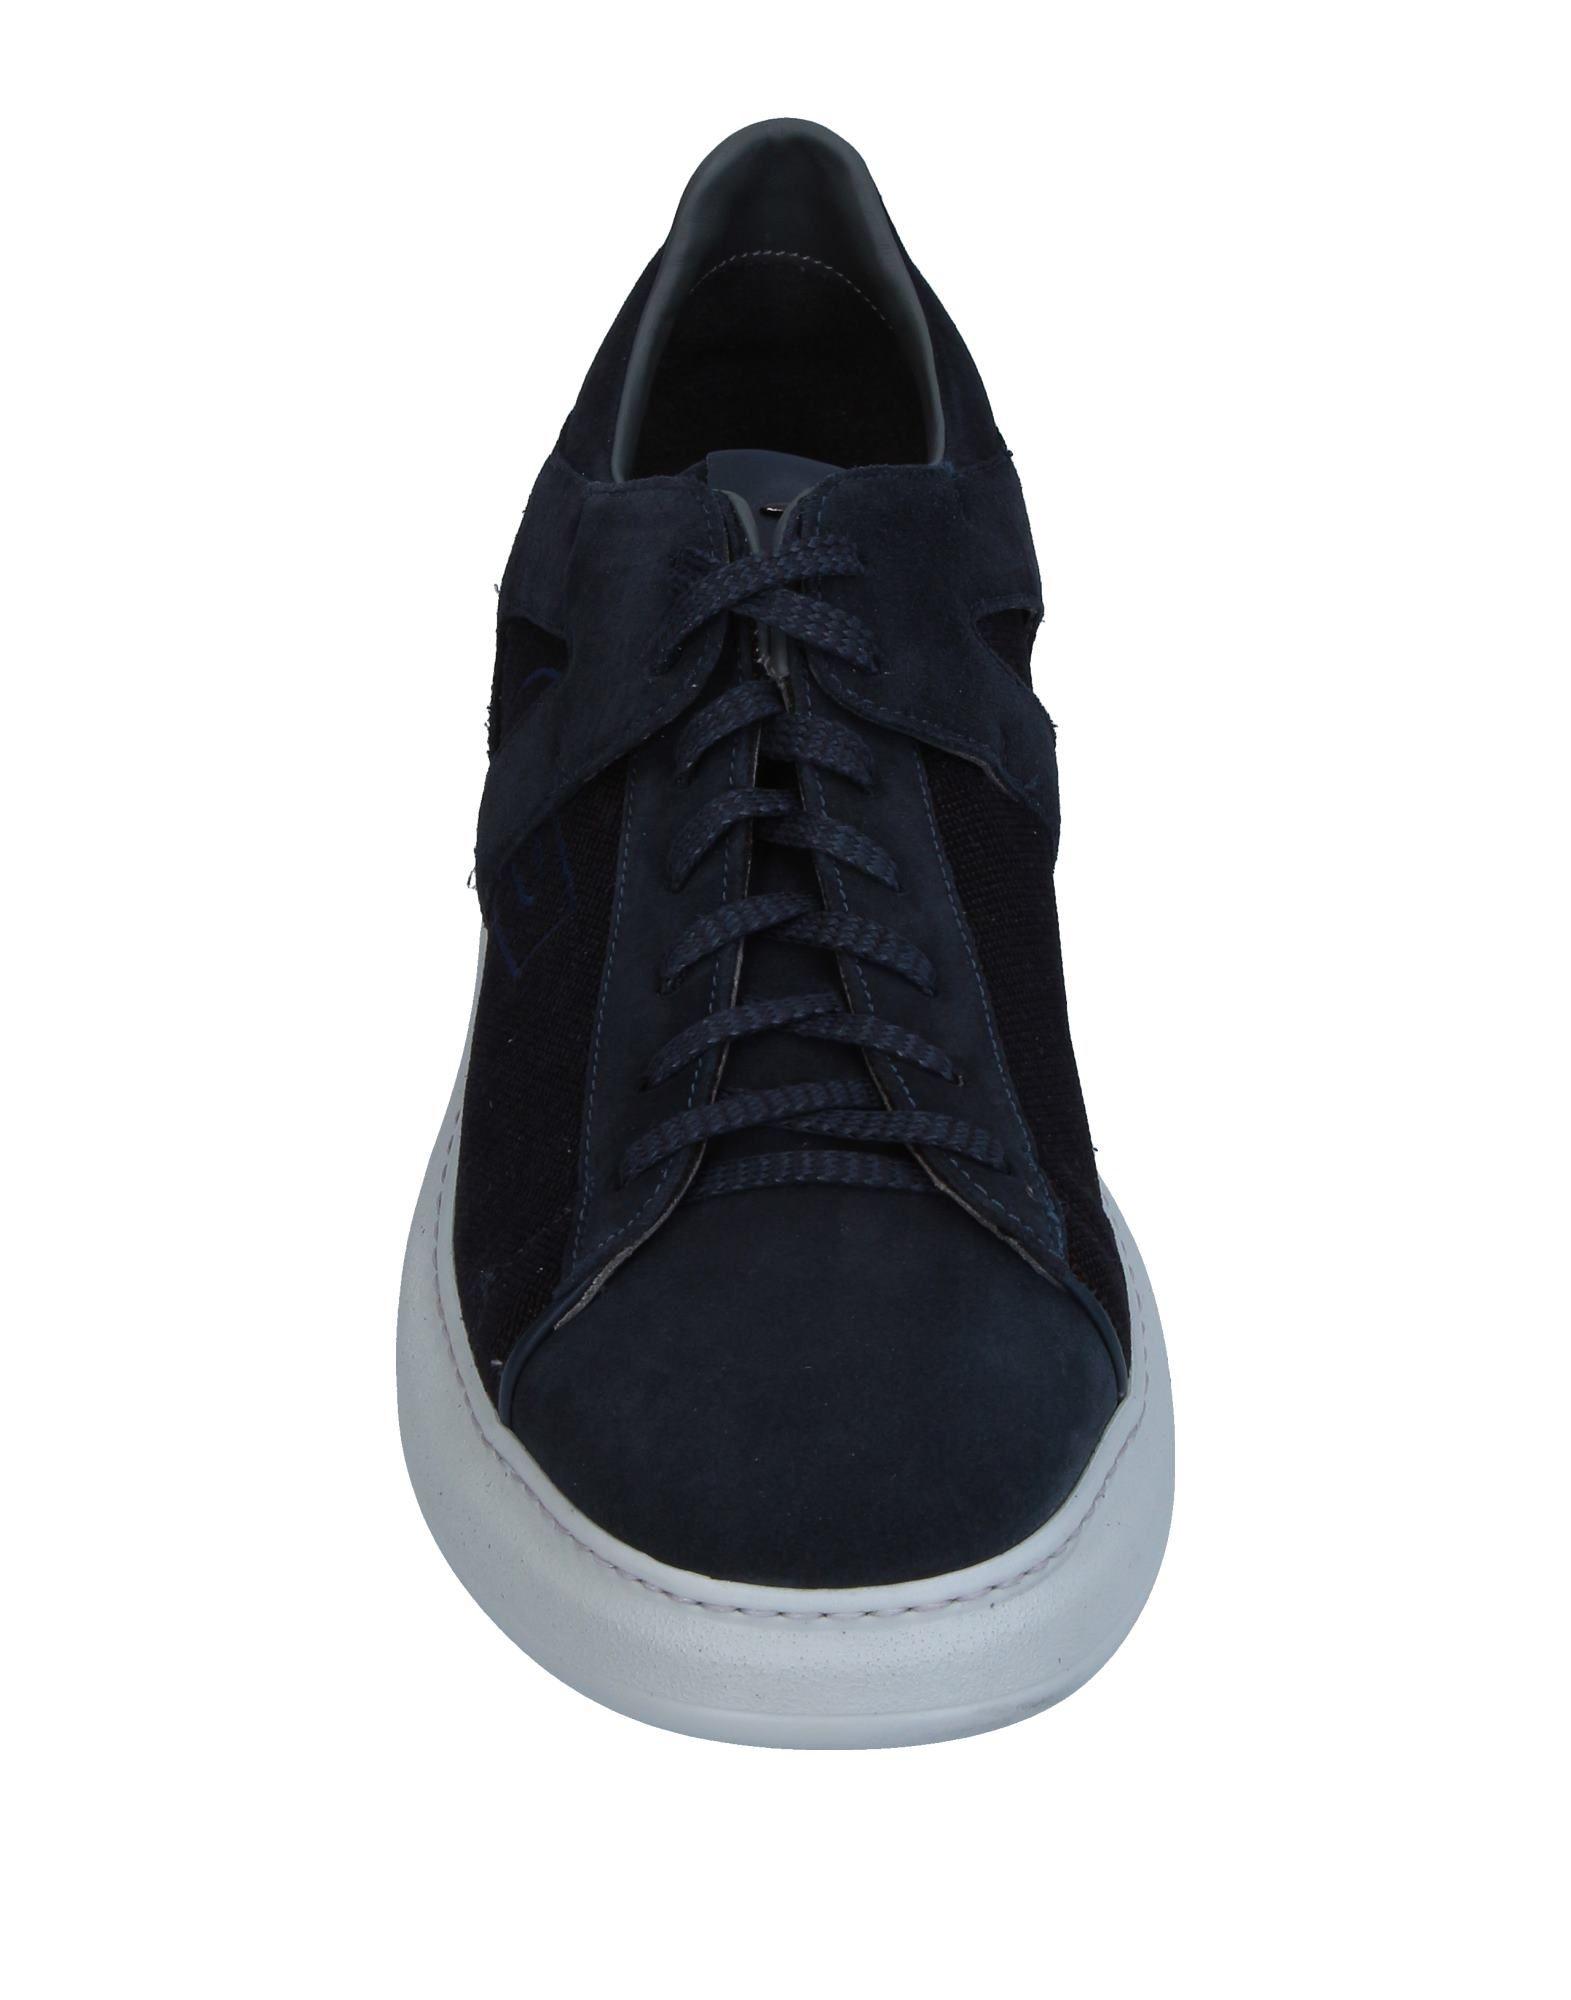 Alberto Guardiani Sneakers - Men on Alberto Guardiani Sneakers online on Men  Australia - 11370976RA fb0397